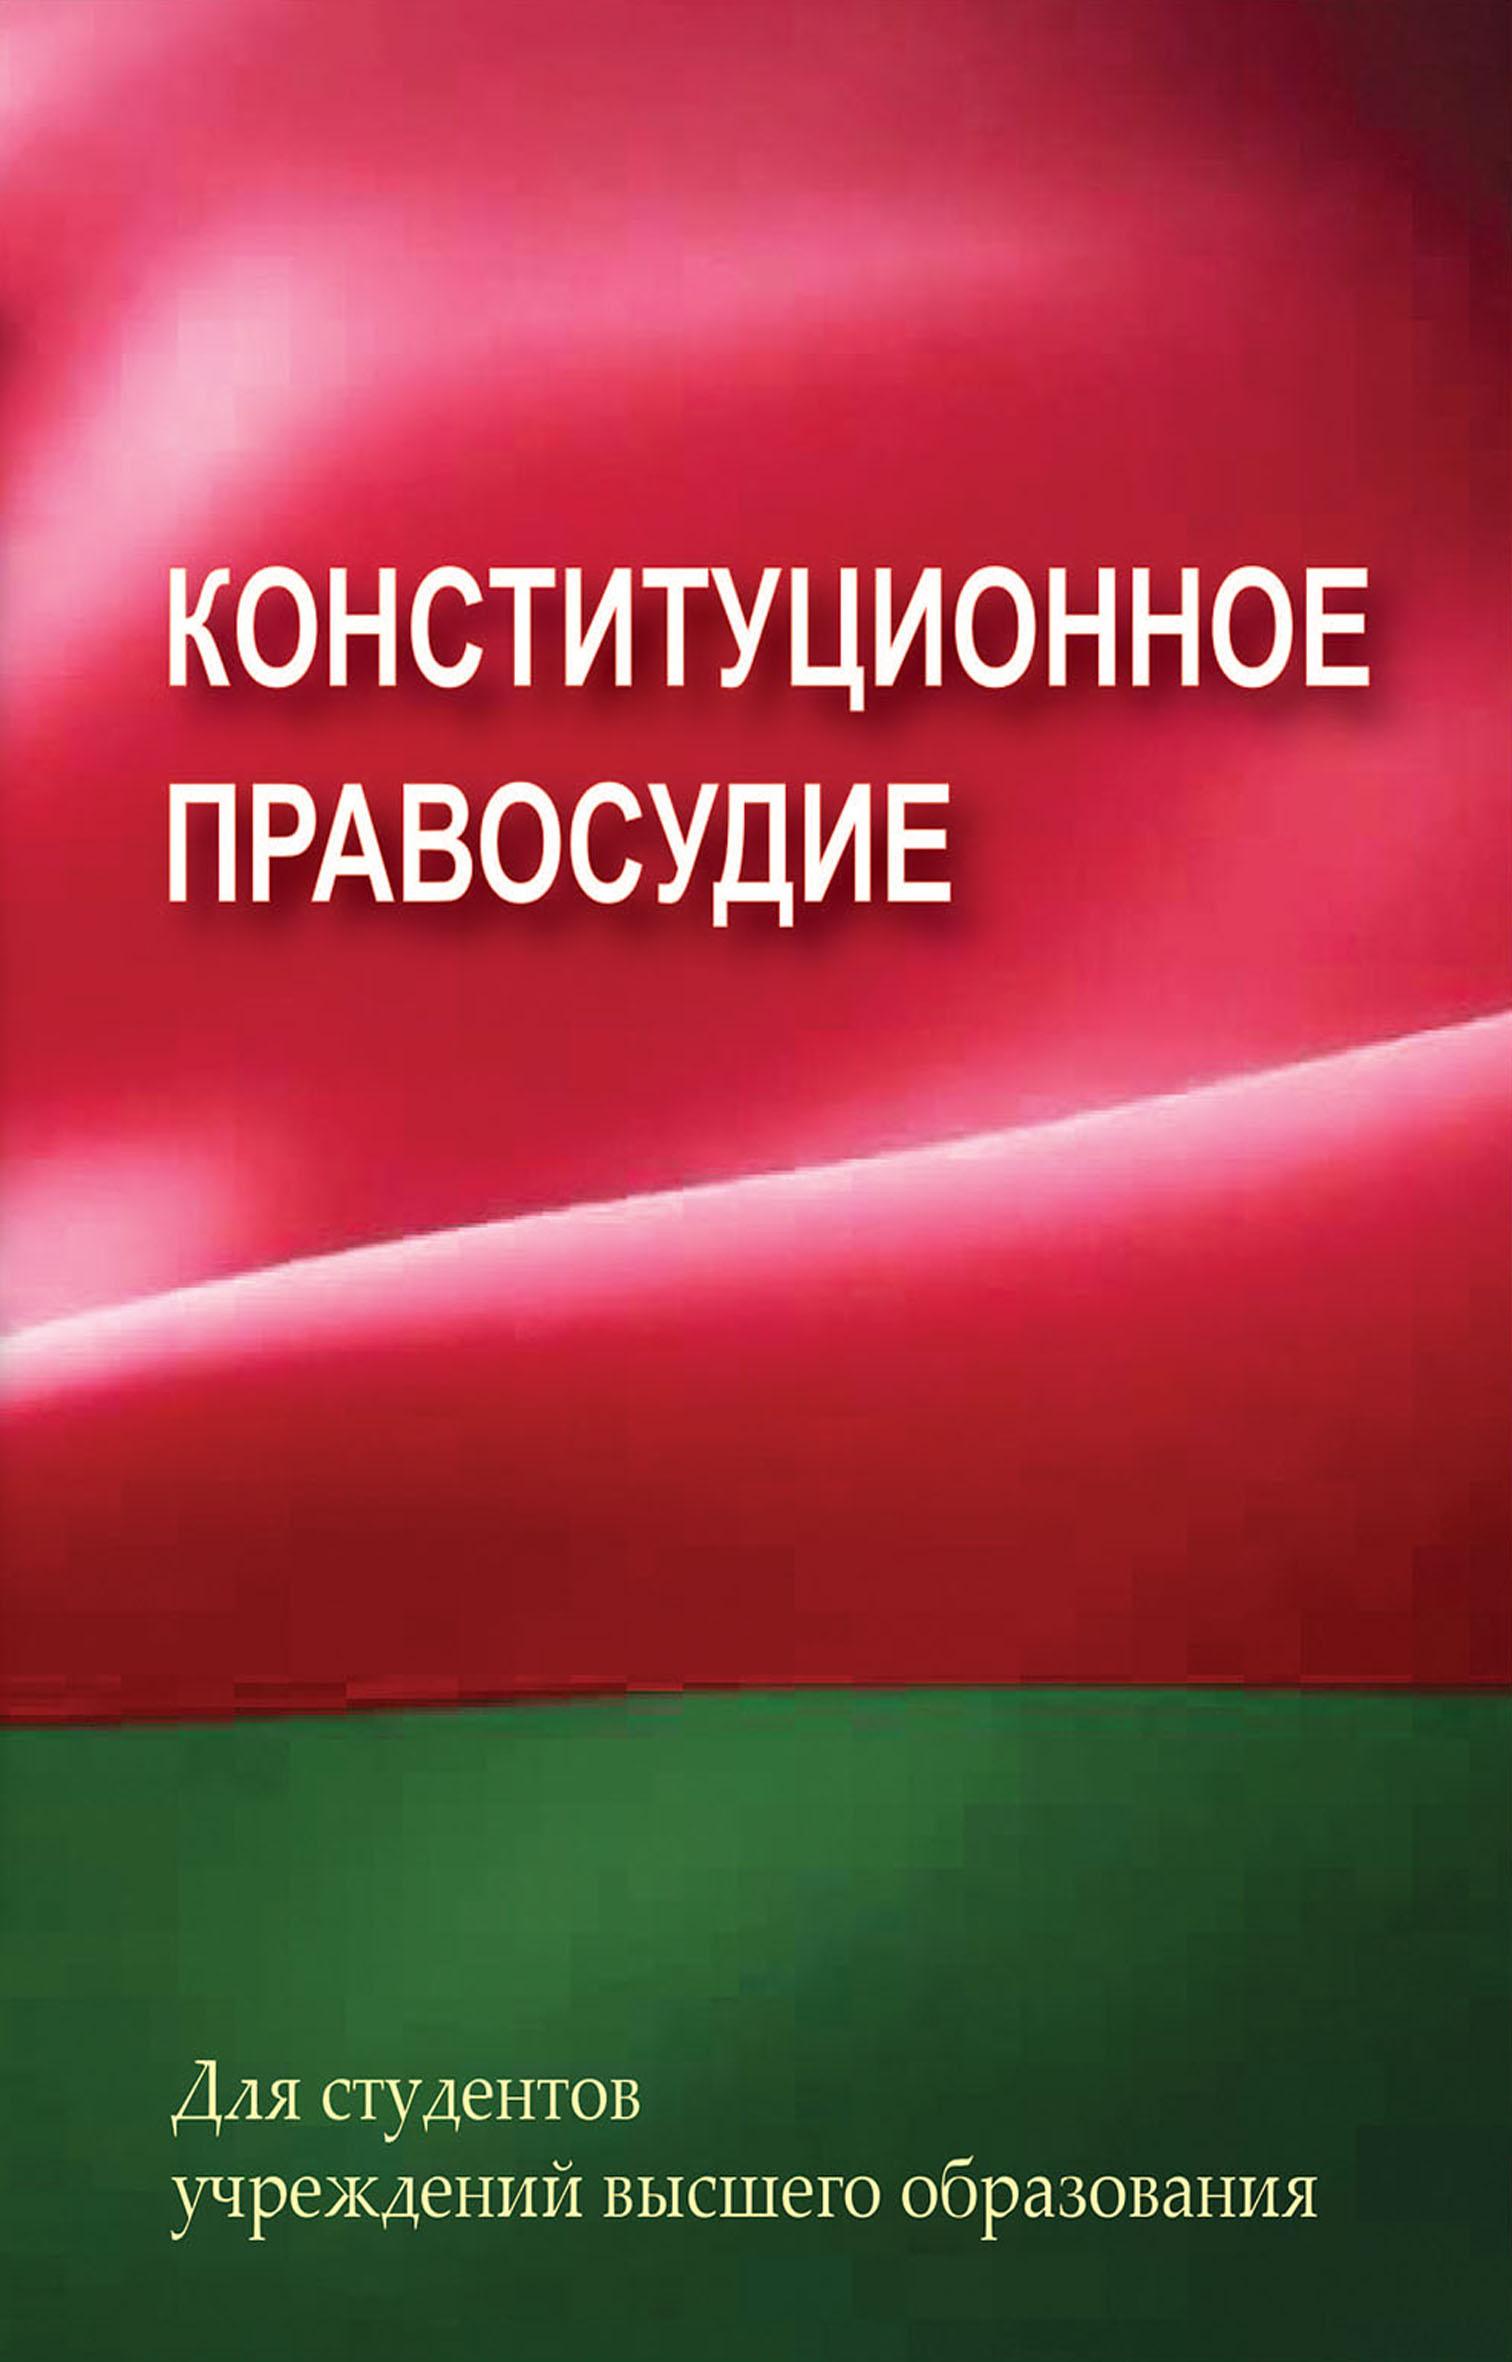 Конституционное правосудие ( Г. А. Василевич  )